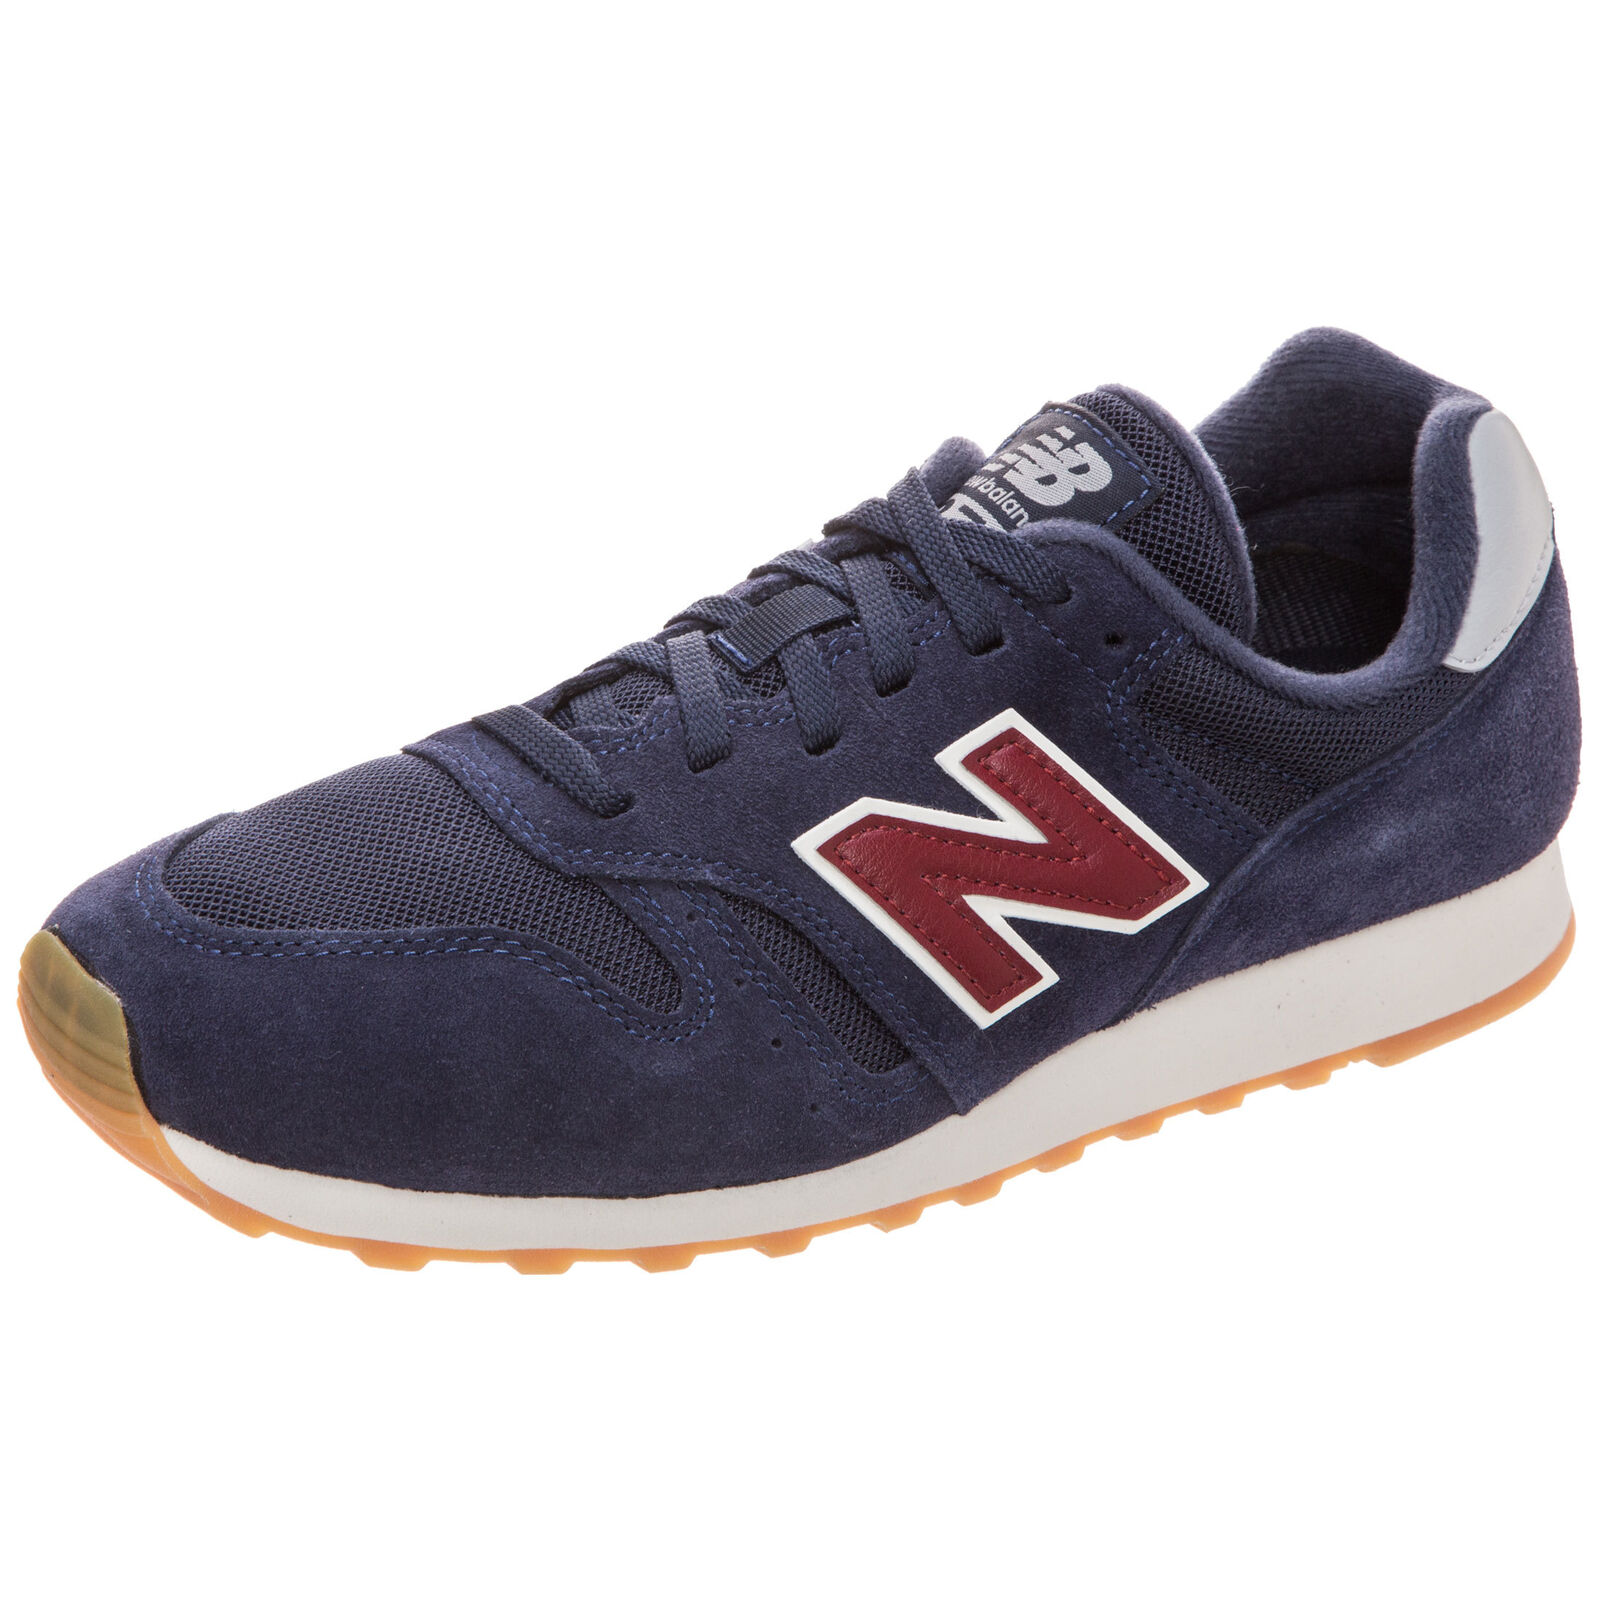 NEU Balance ML373-NRG-D Sneaker Blau NEU Schuhe Turnschuhe